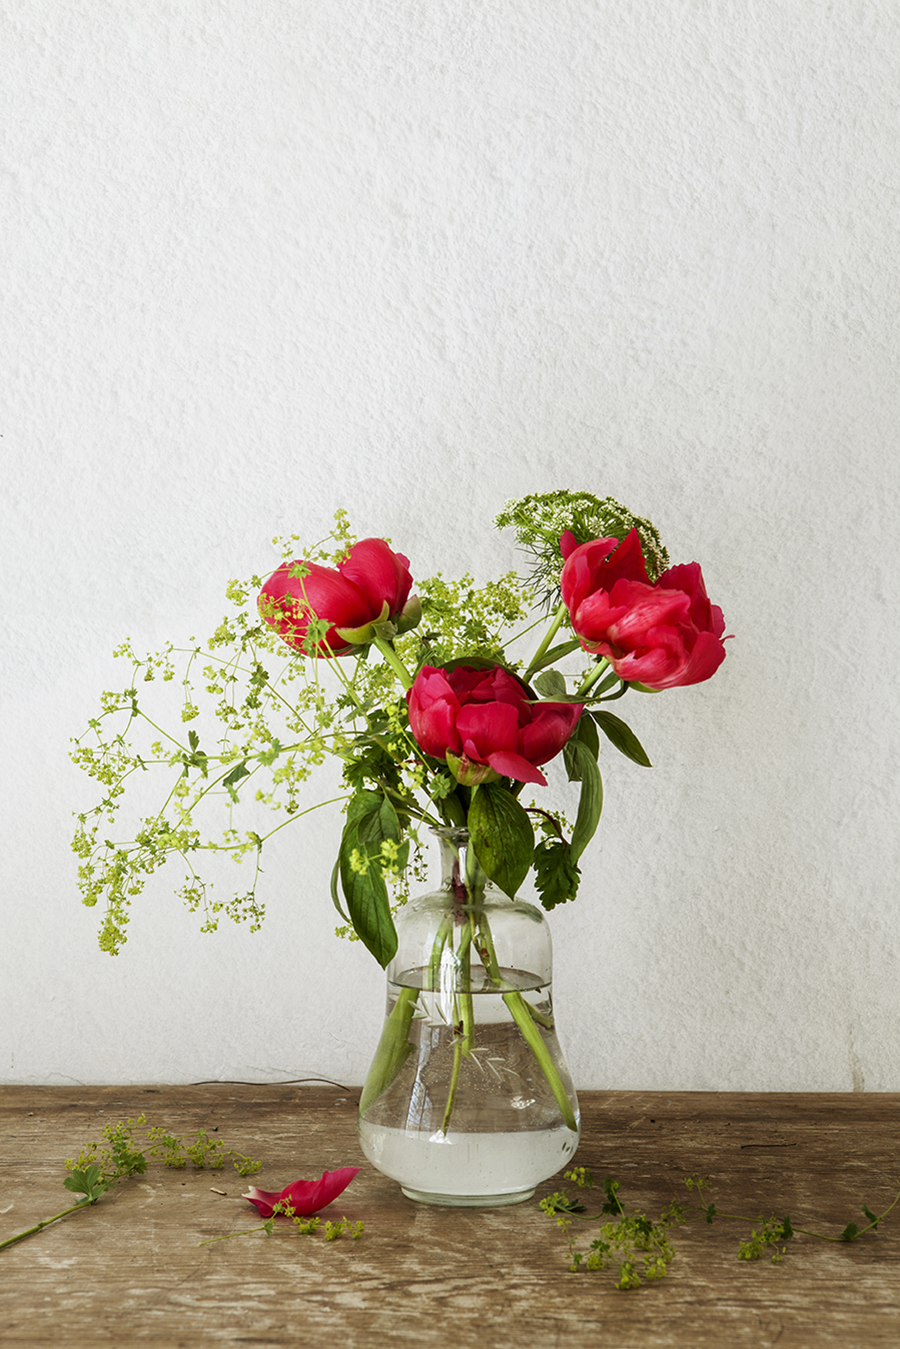 *** Local Caption *** JarrÛn de cristal con flores / arreglos florales / obra de InÈs Urquijo NUEVO ESTILO 459 01/06/2016 P230